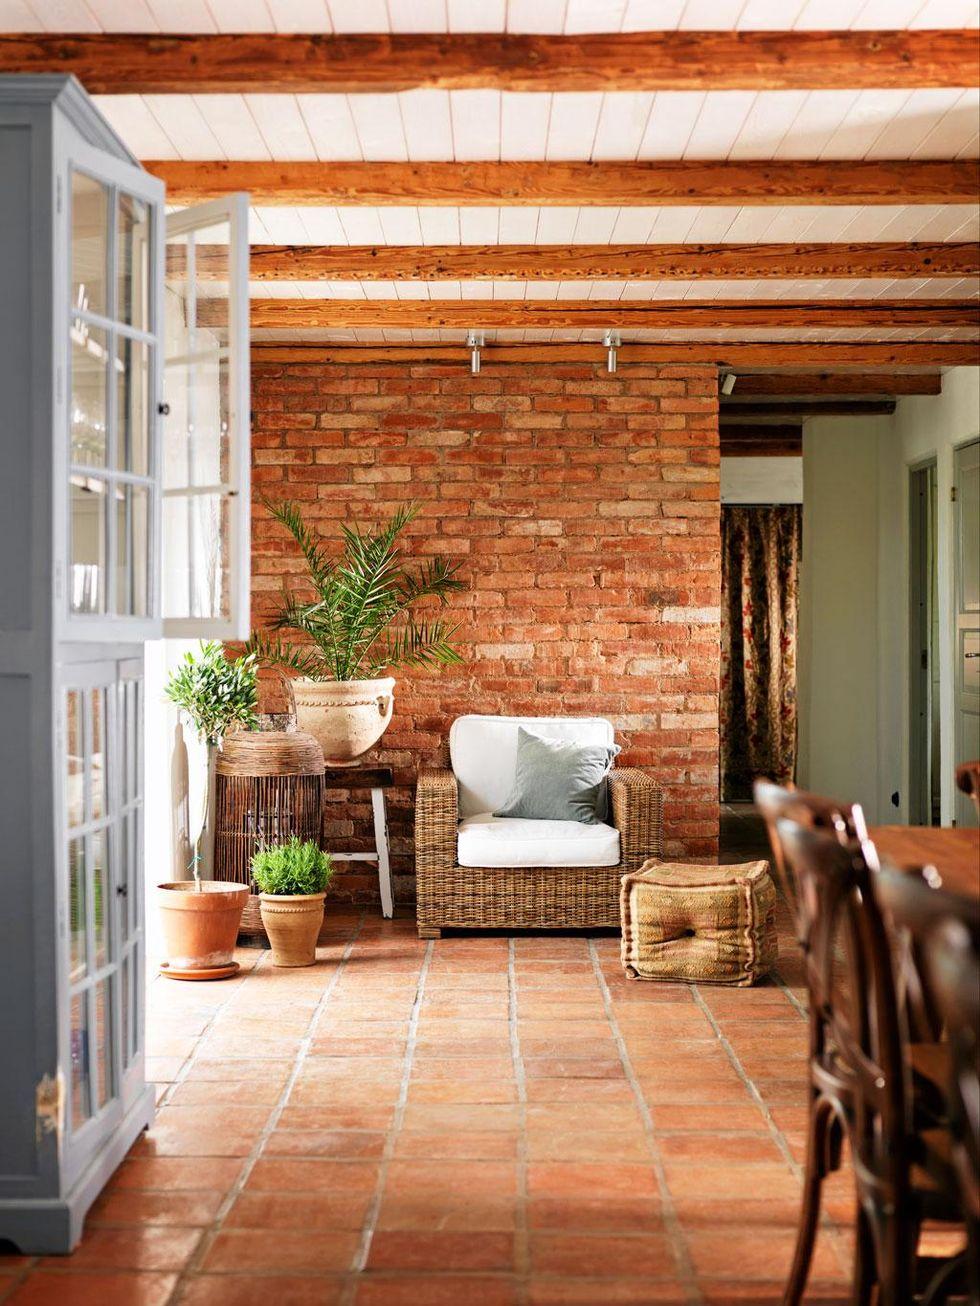 Interior Decor Trends for 2017: terracotta